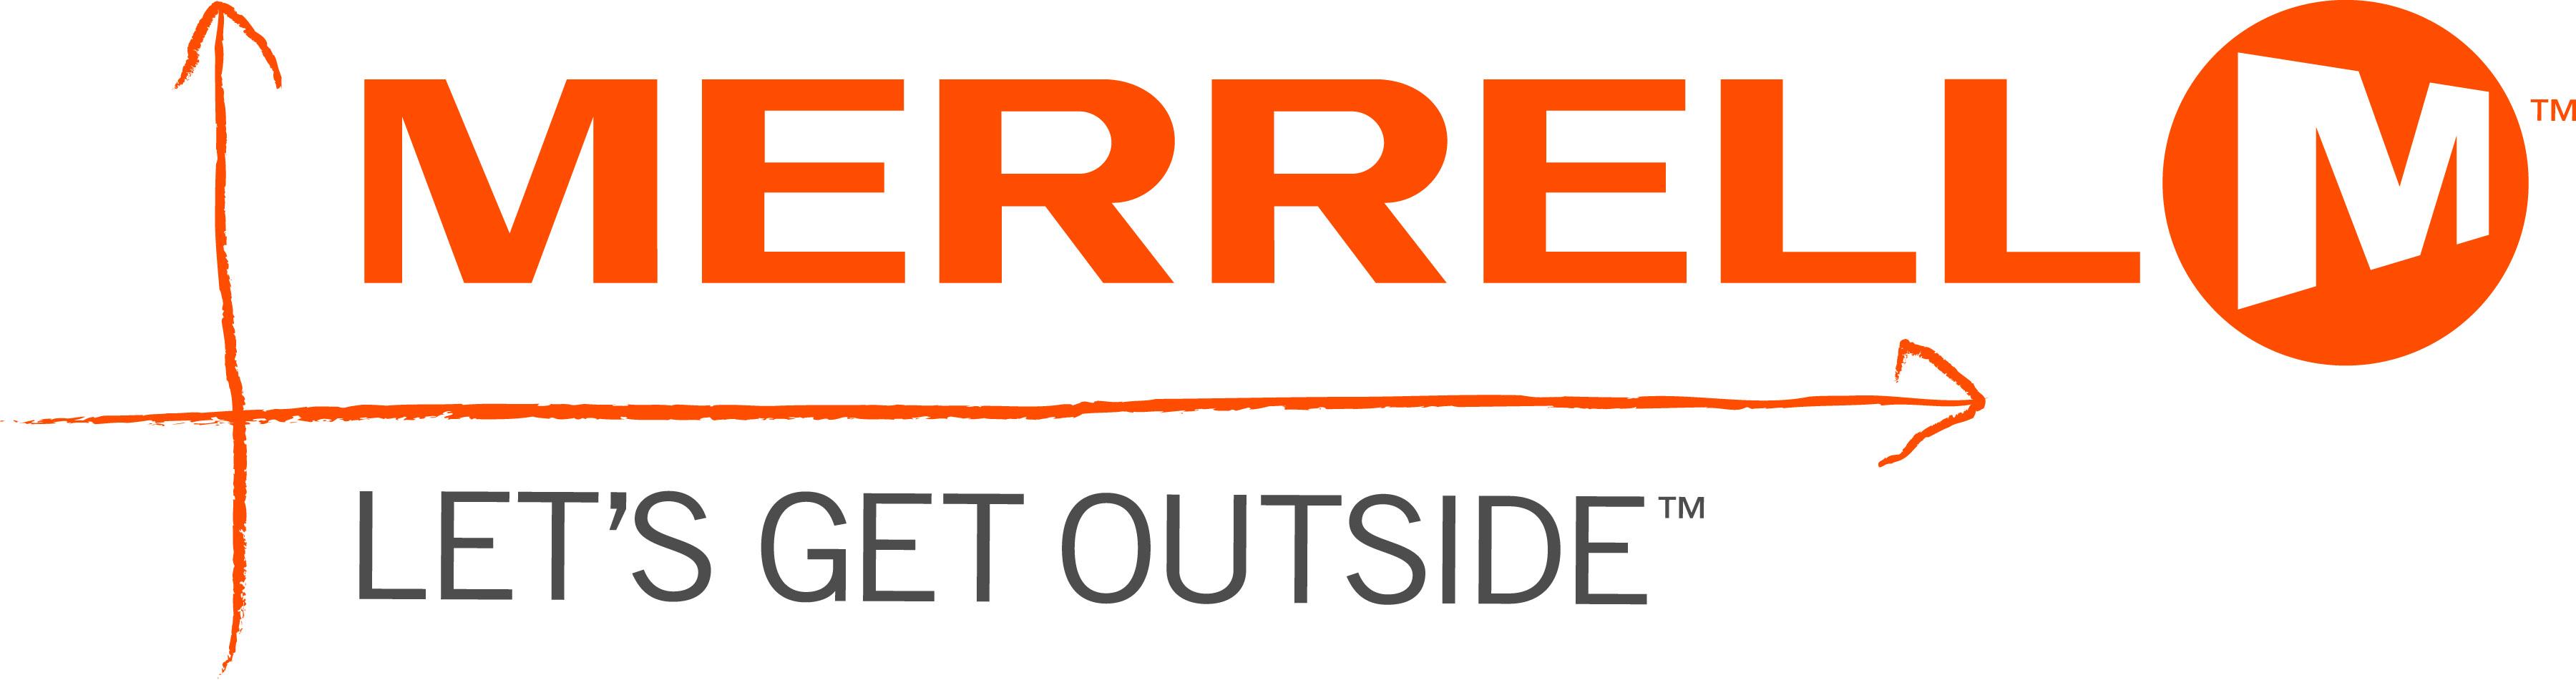 Merrell Logo 947595f4be5